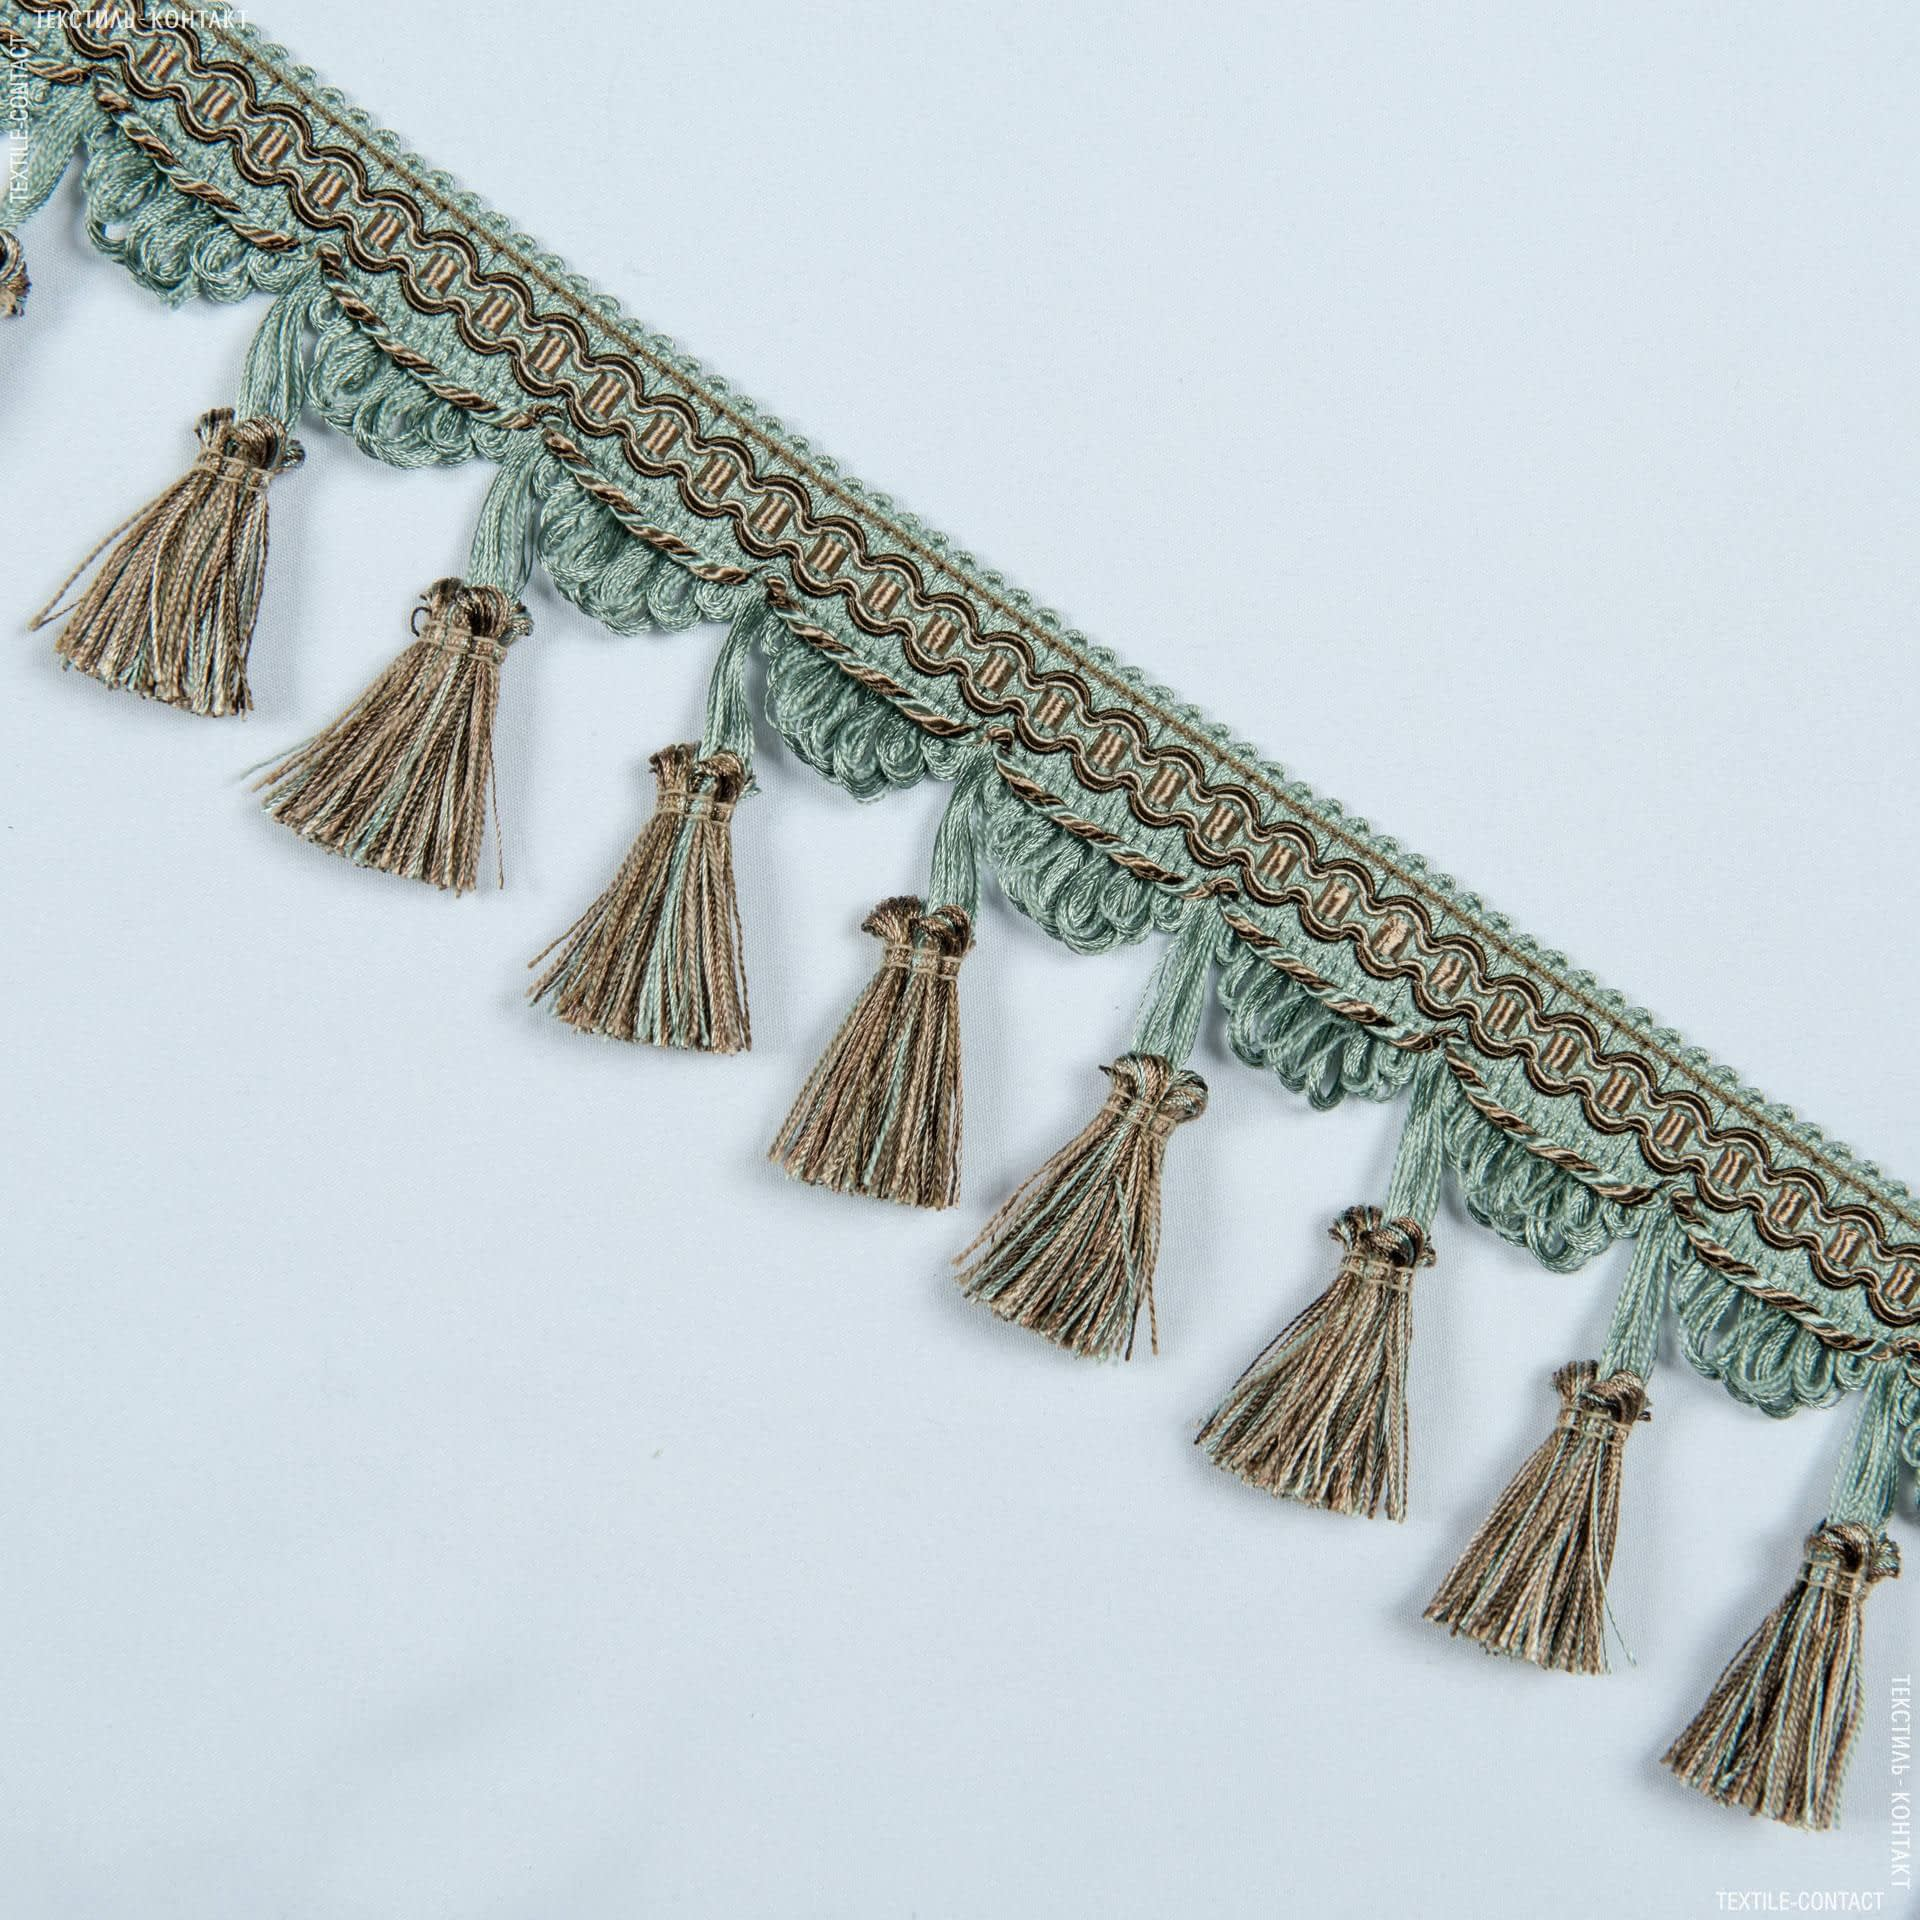 Ткани фурнитура для декора - Бахрома имеджен кисточка коричневый-бирюза